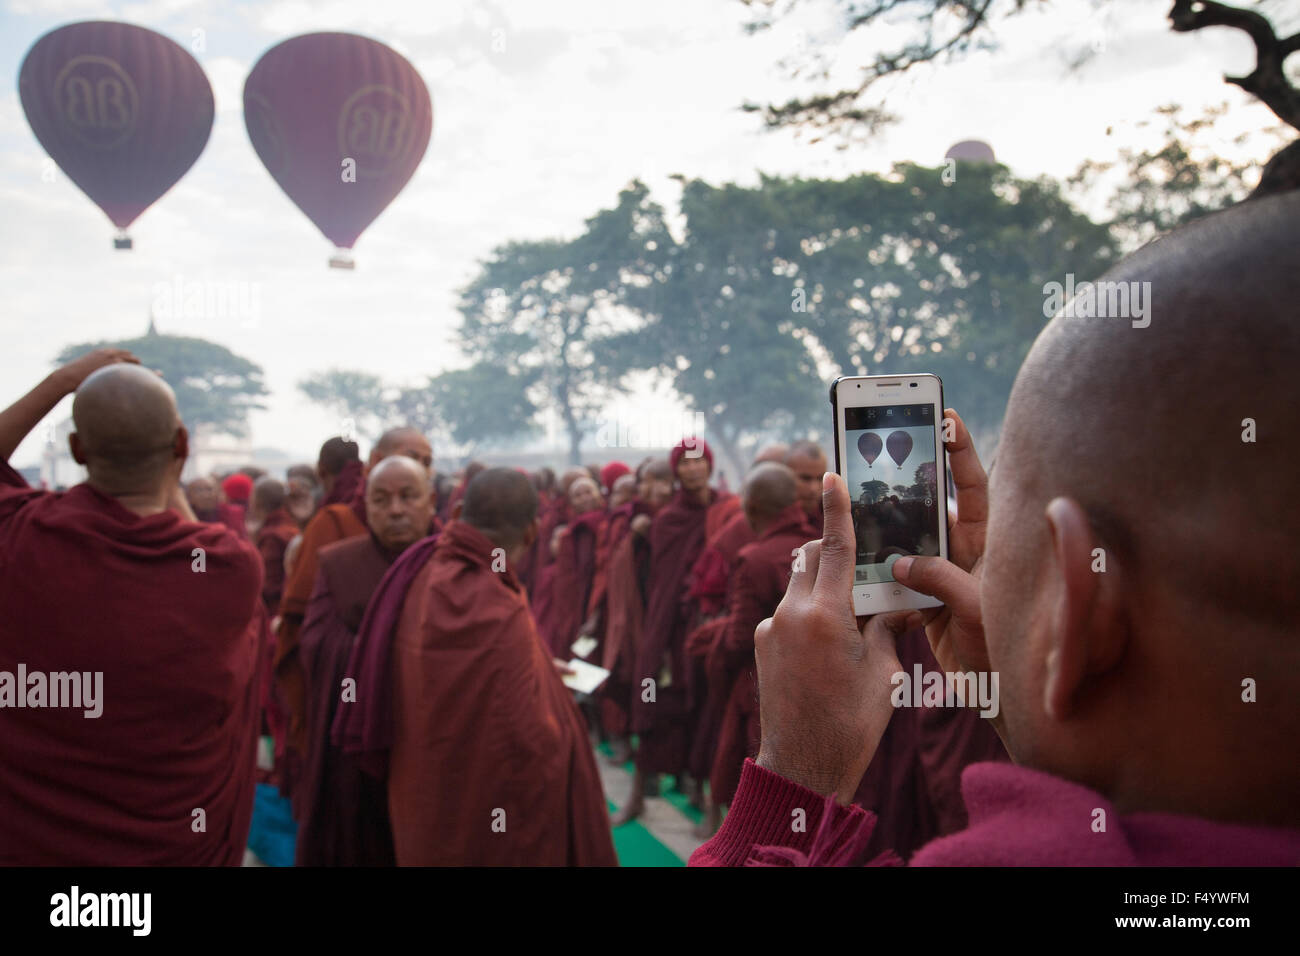 The Ananda pagoda festivals in Bagan - Stock Image